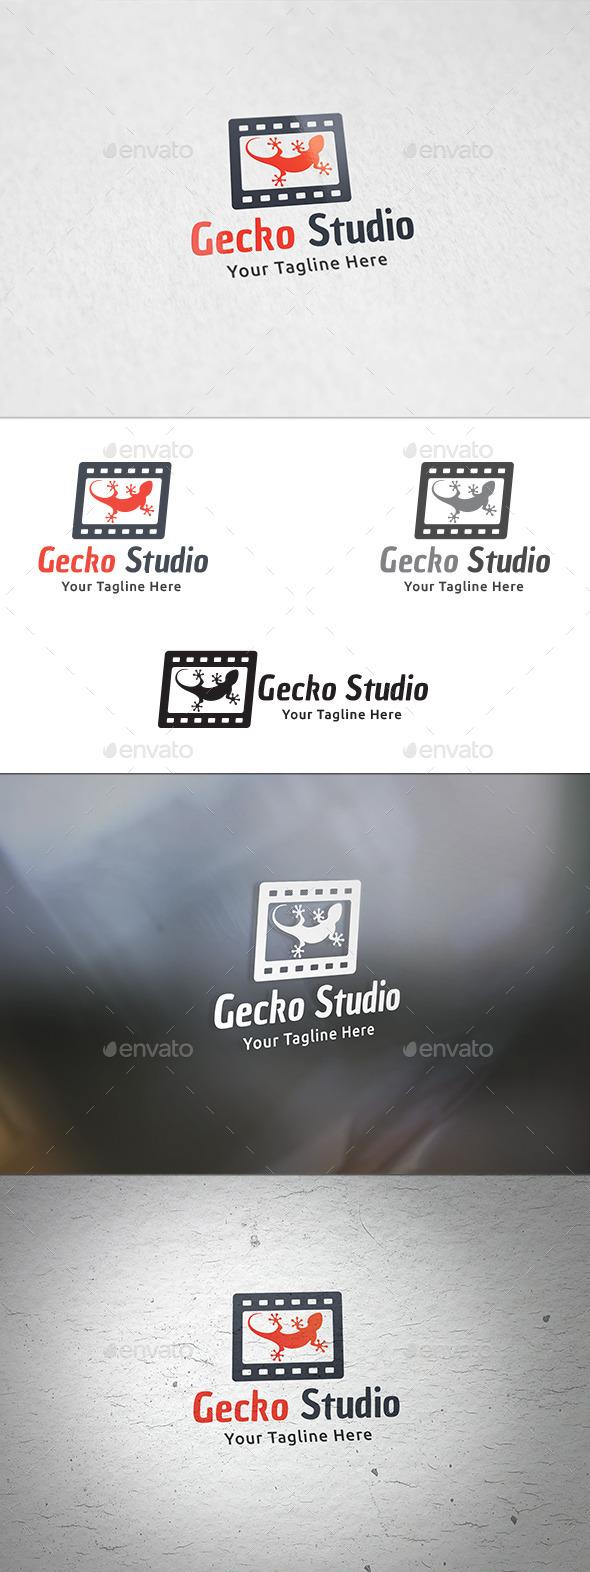 Gecko Studio - Logo Template